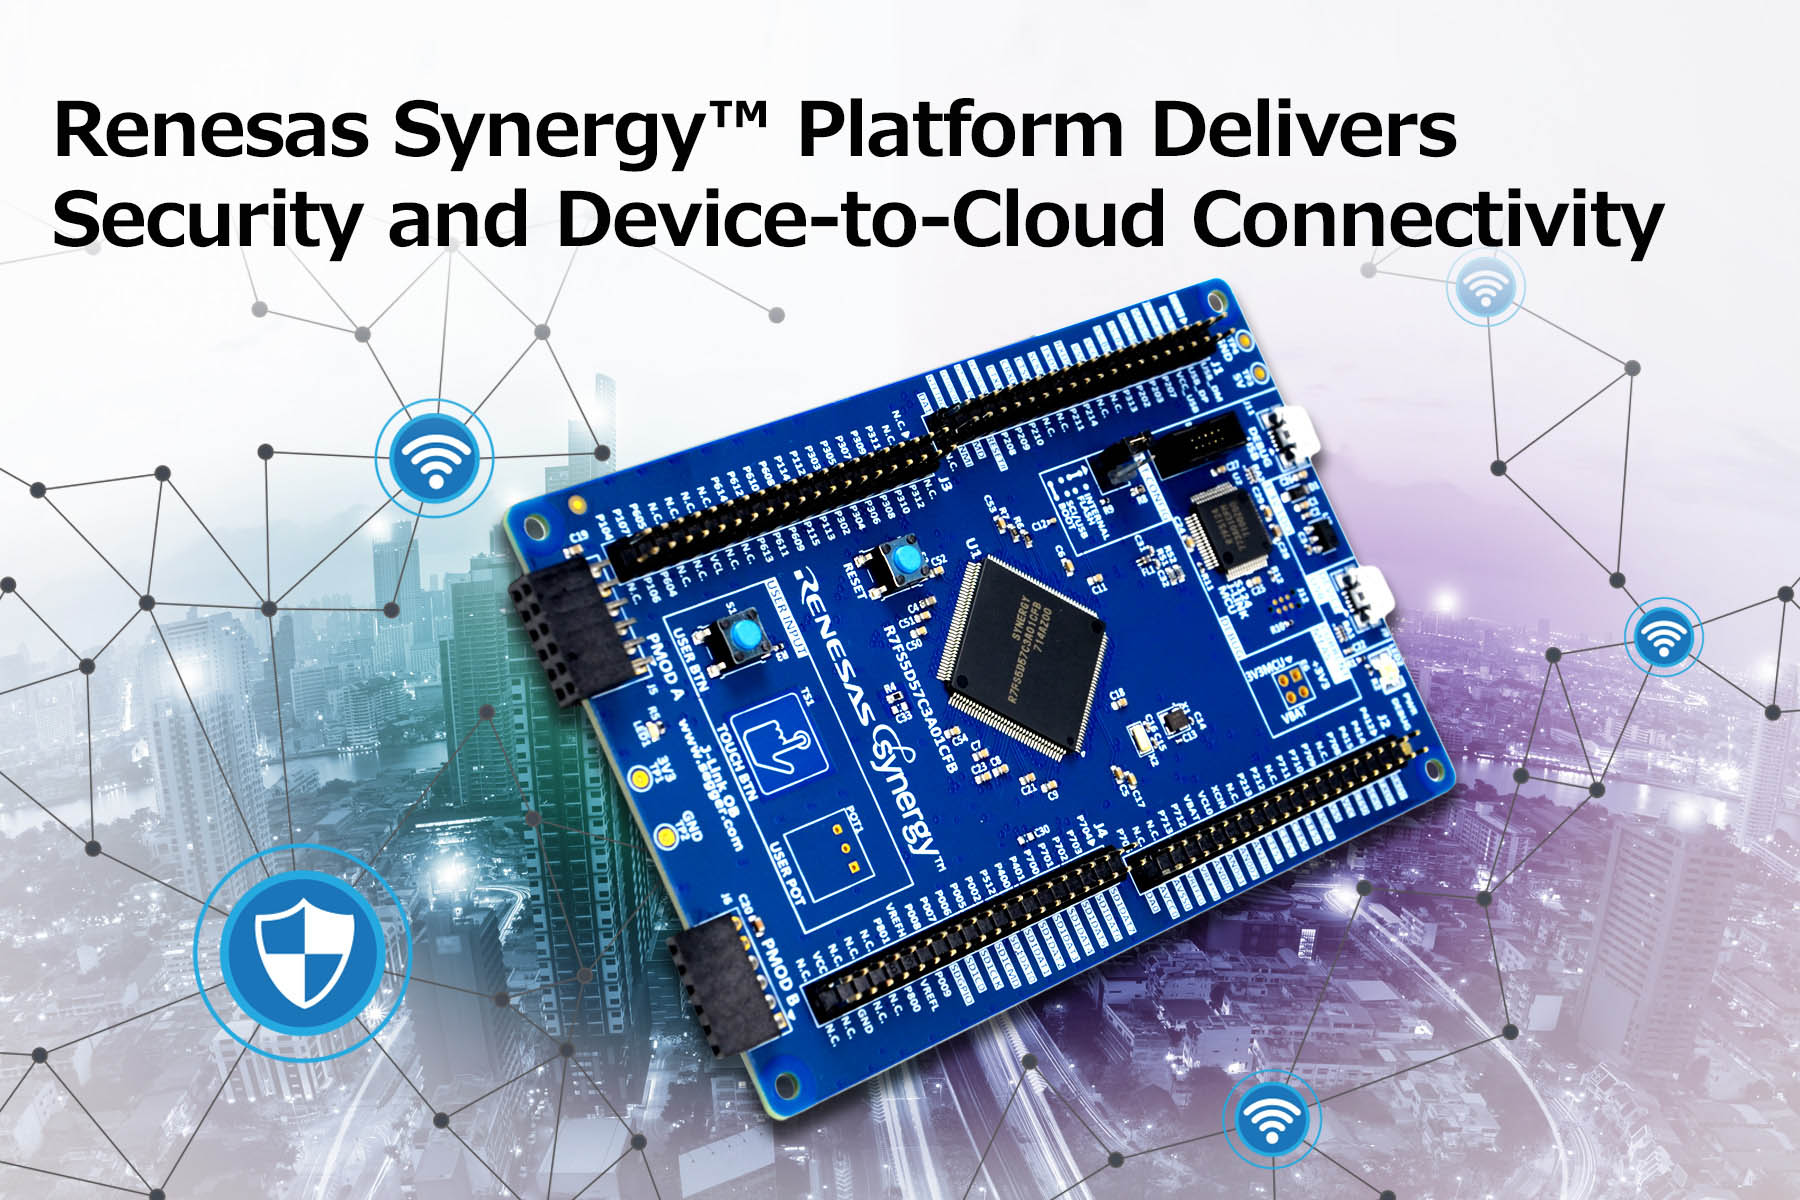 Renesas aktualisiert IoT-Plattform